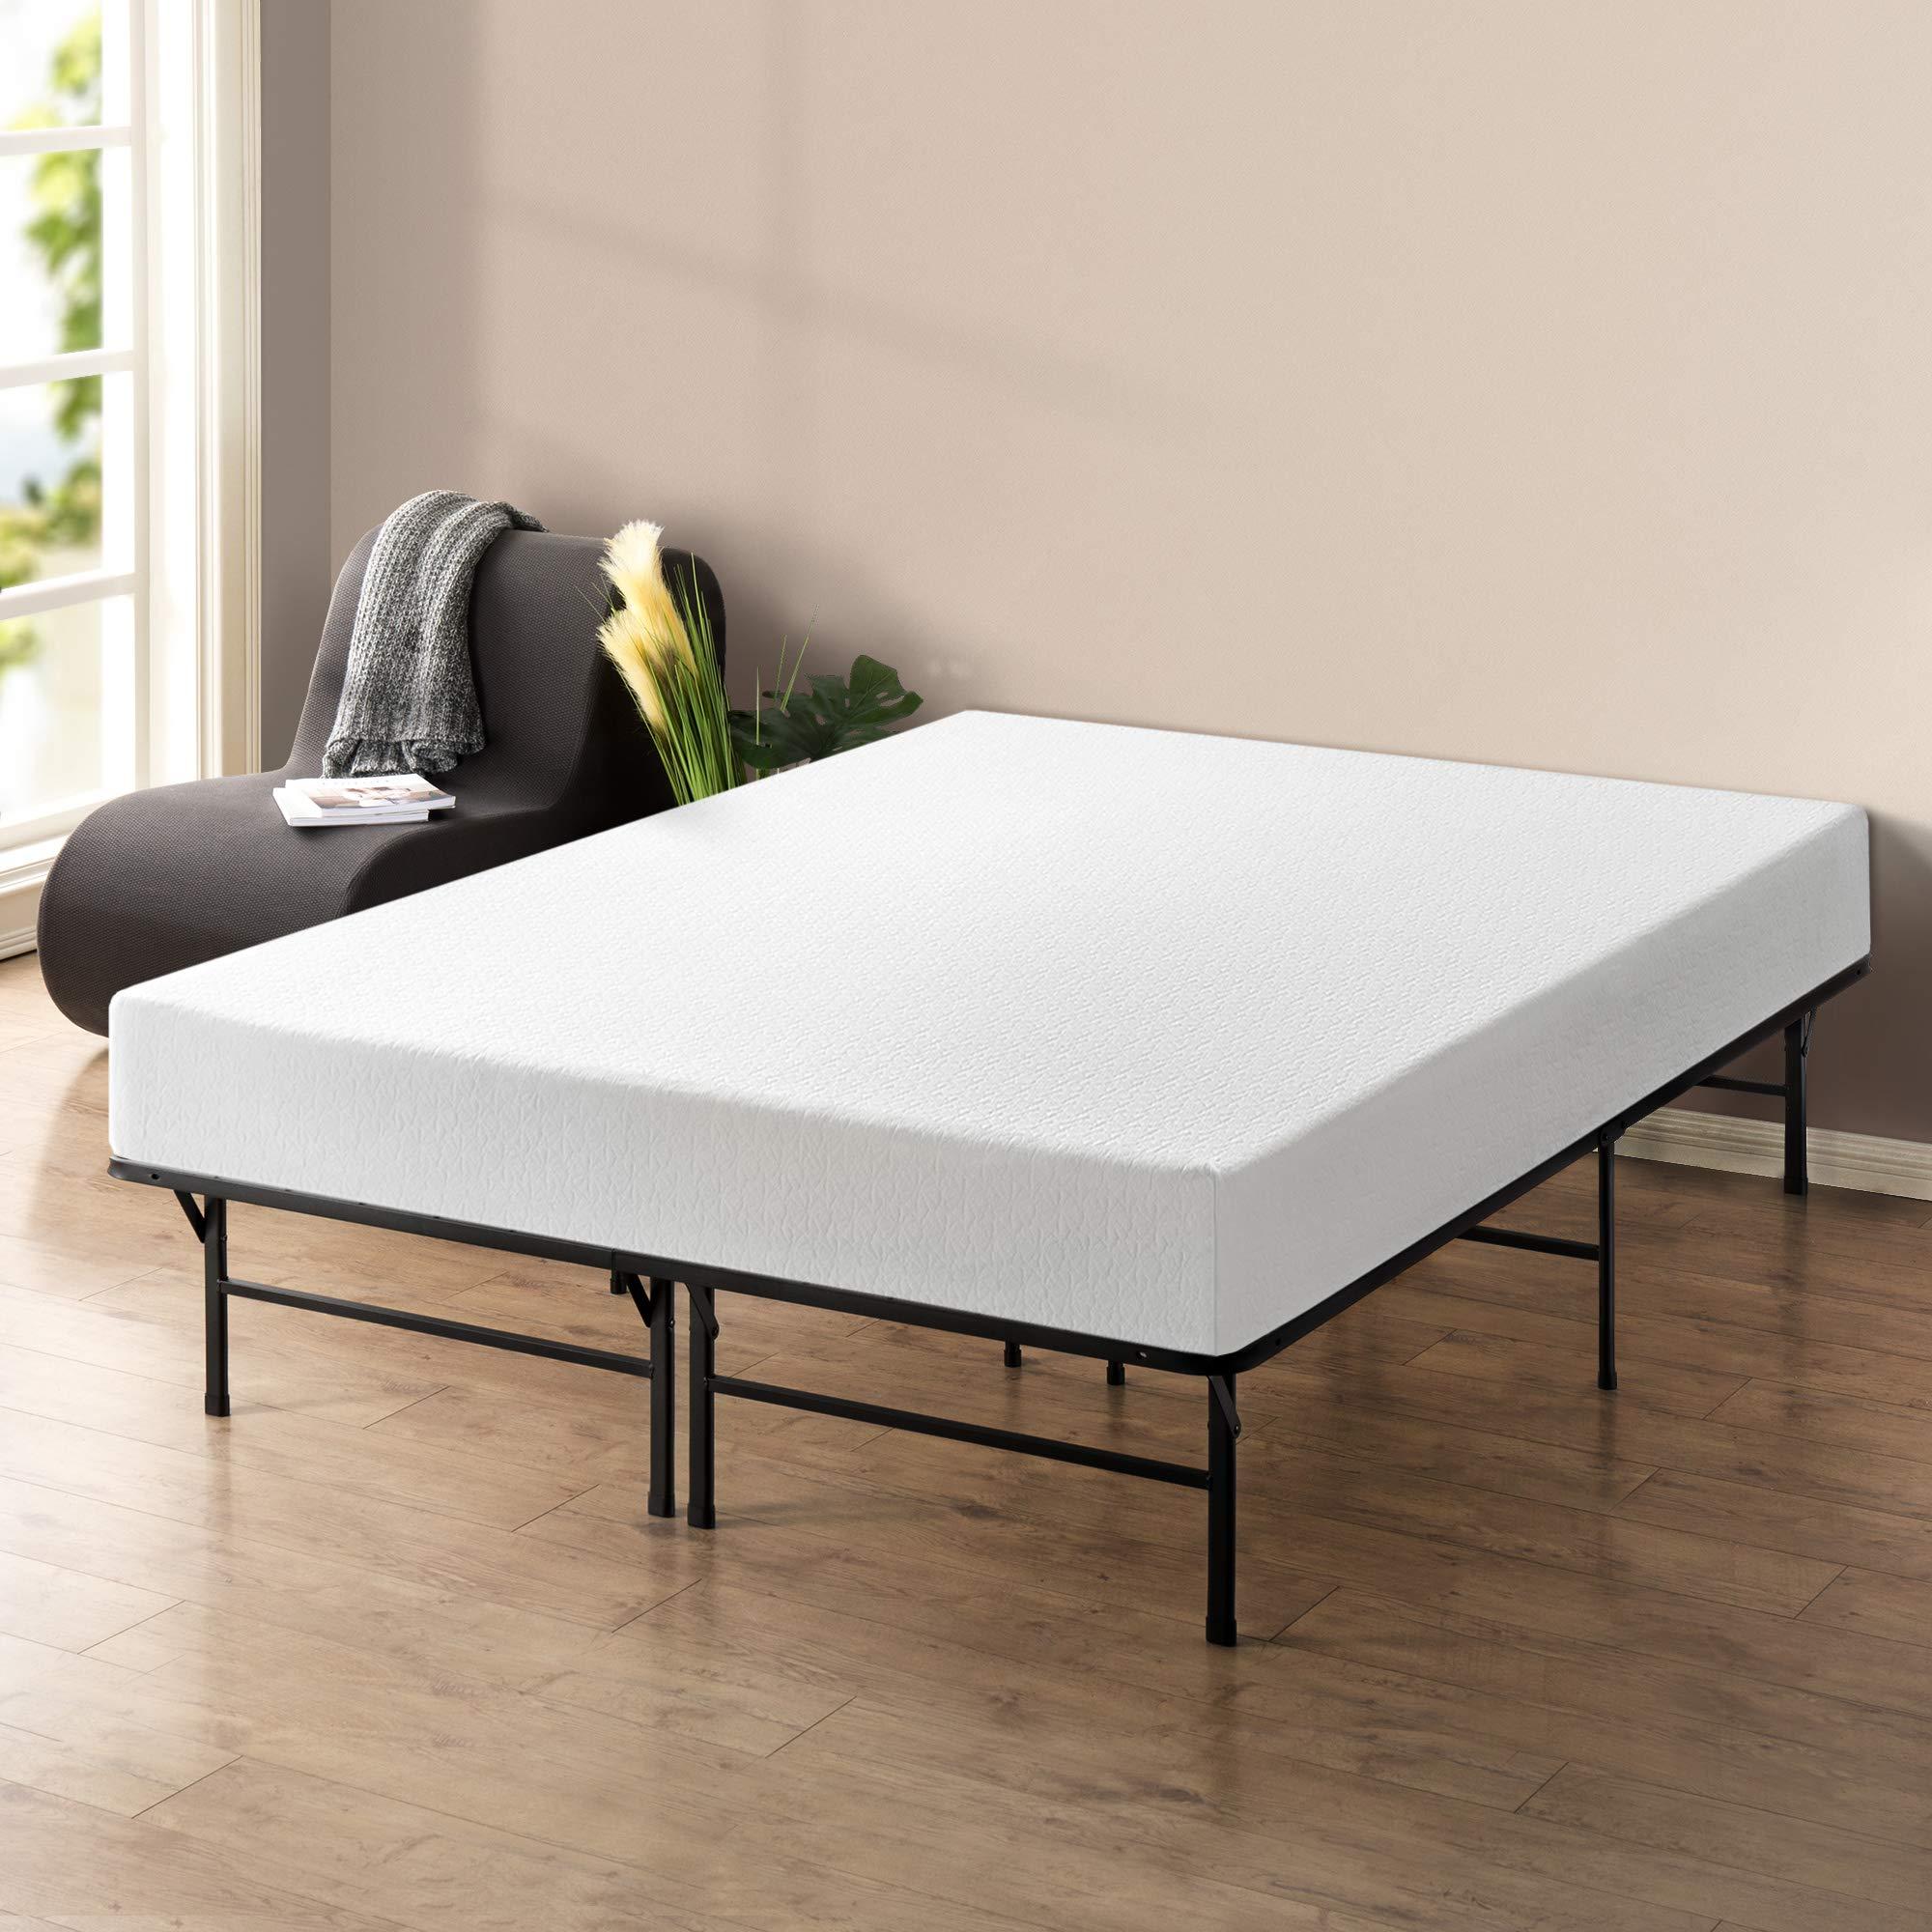 Best Price Mattress 10'' Memory Foam Mattress and 14'' Premium Steel Bed Frame/Foundation Set, Queen